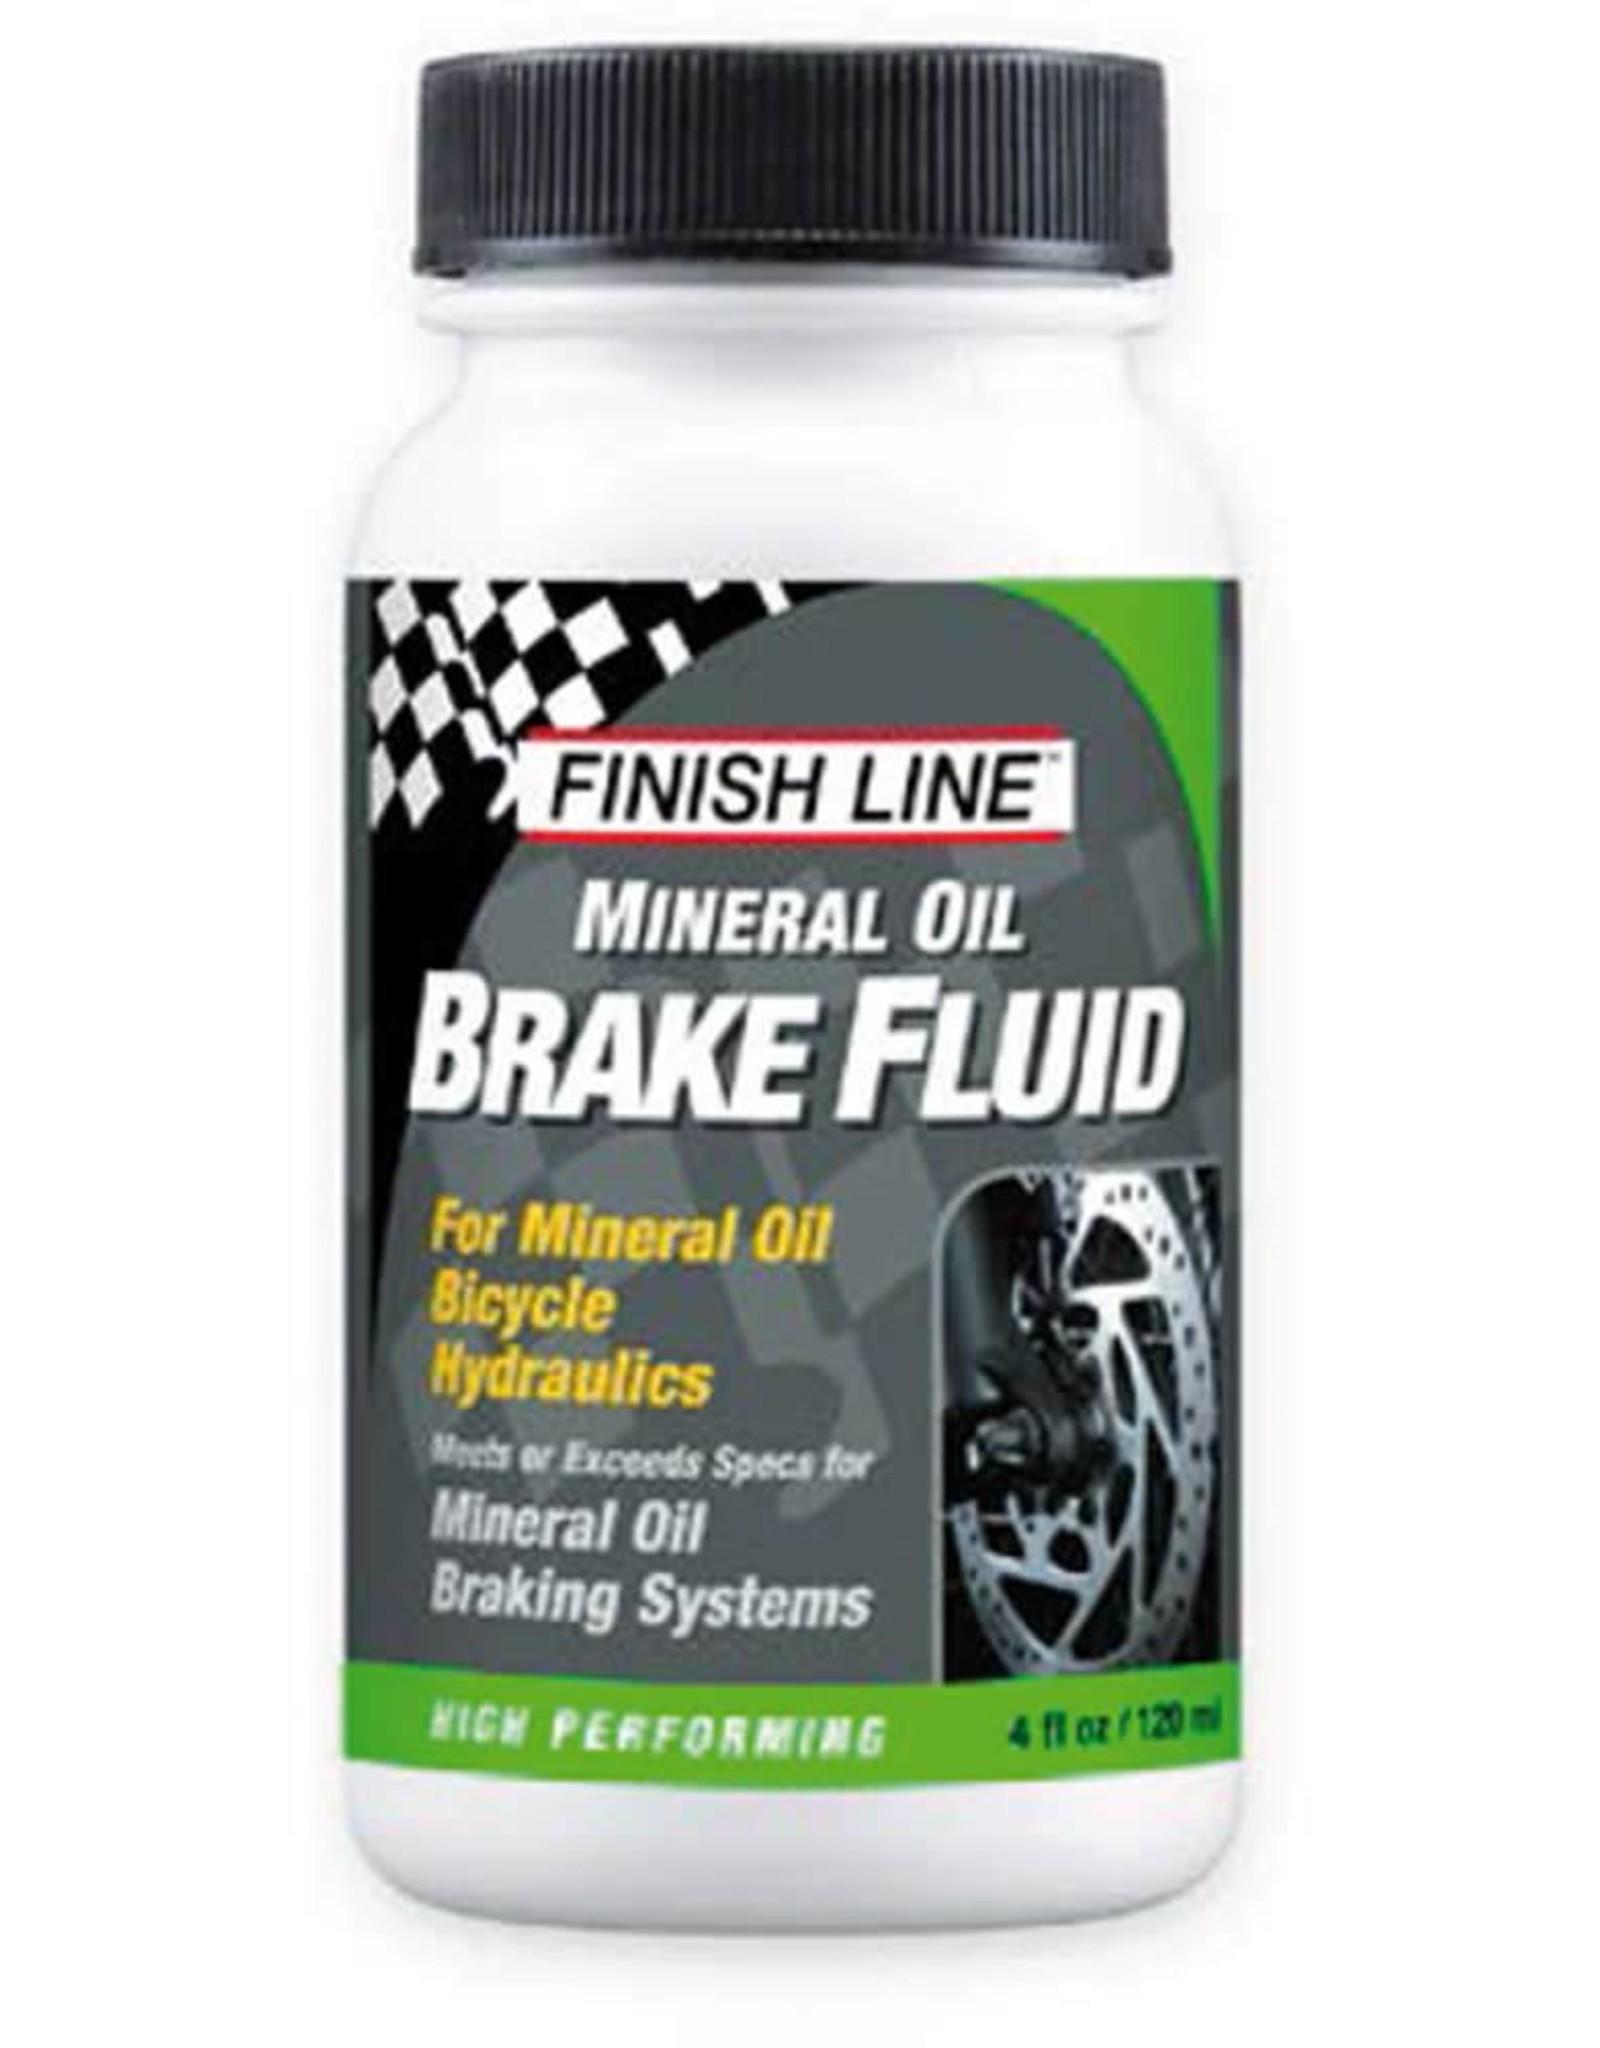 FINISH LINE Finish Line Mineral Brake Fluid 4oz Big Mouth (Single Unit)